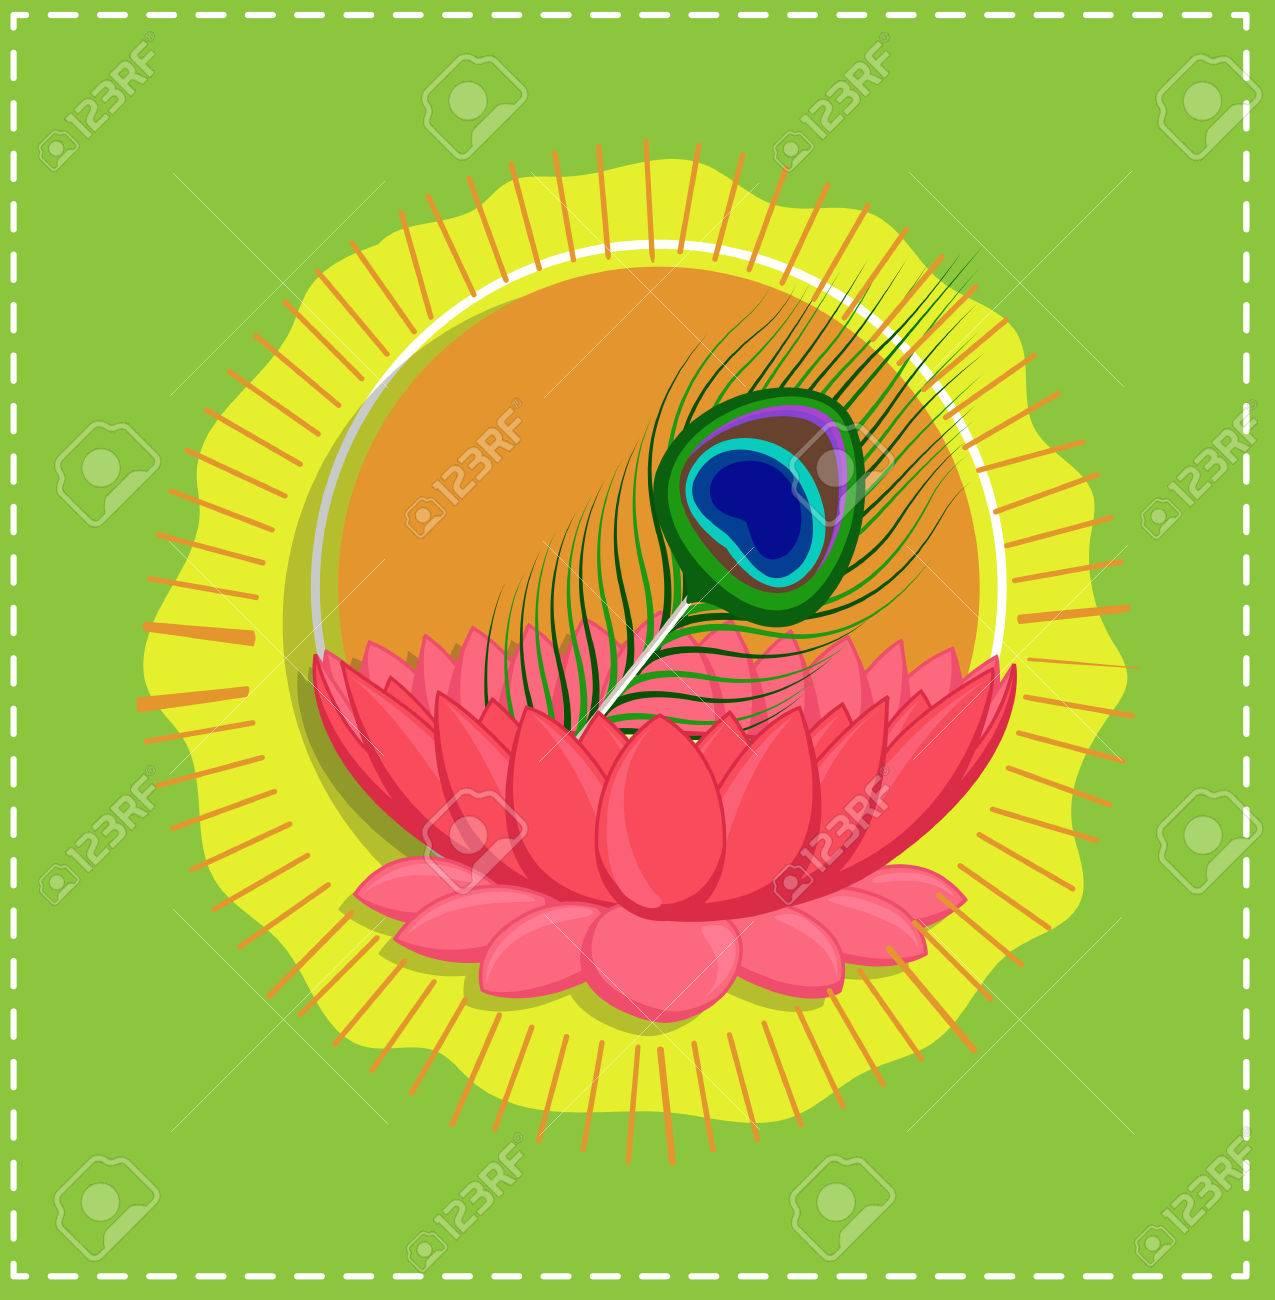 Peacock Feather In Lotus Flower - Spiritual Indian